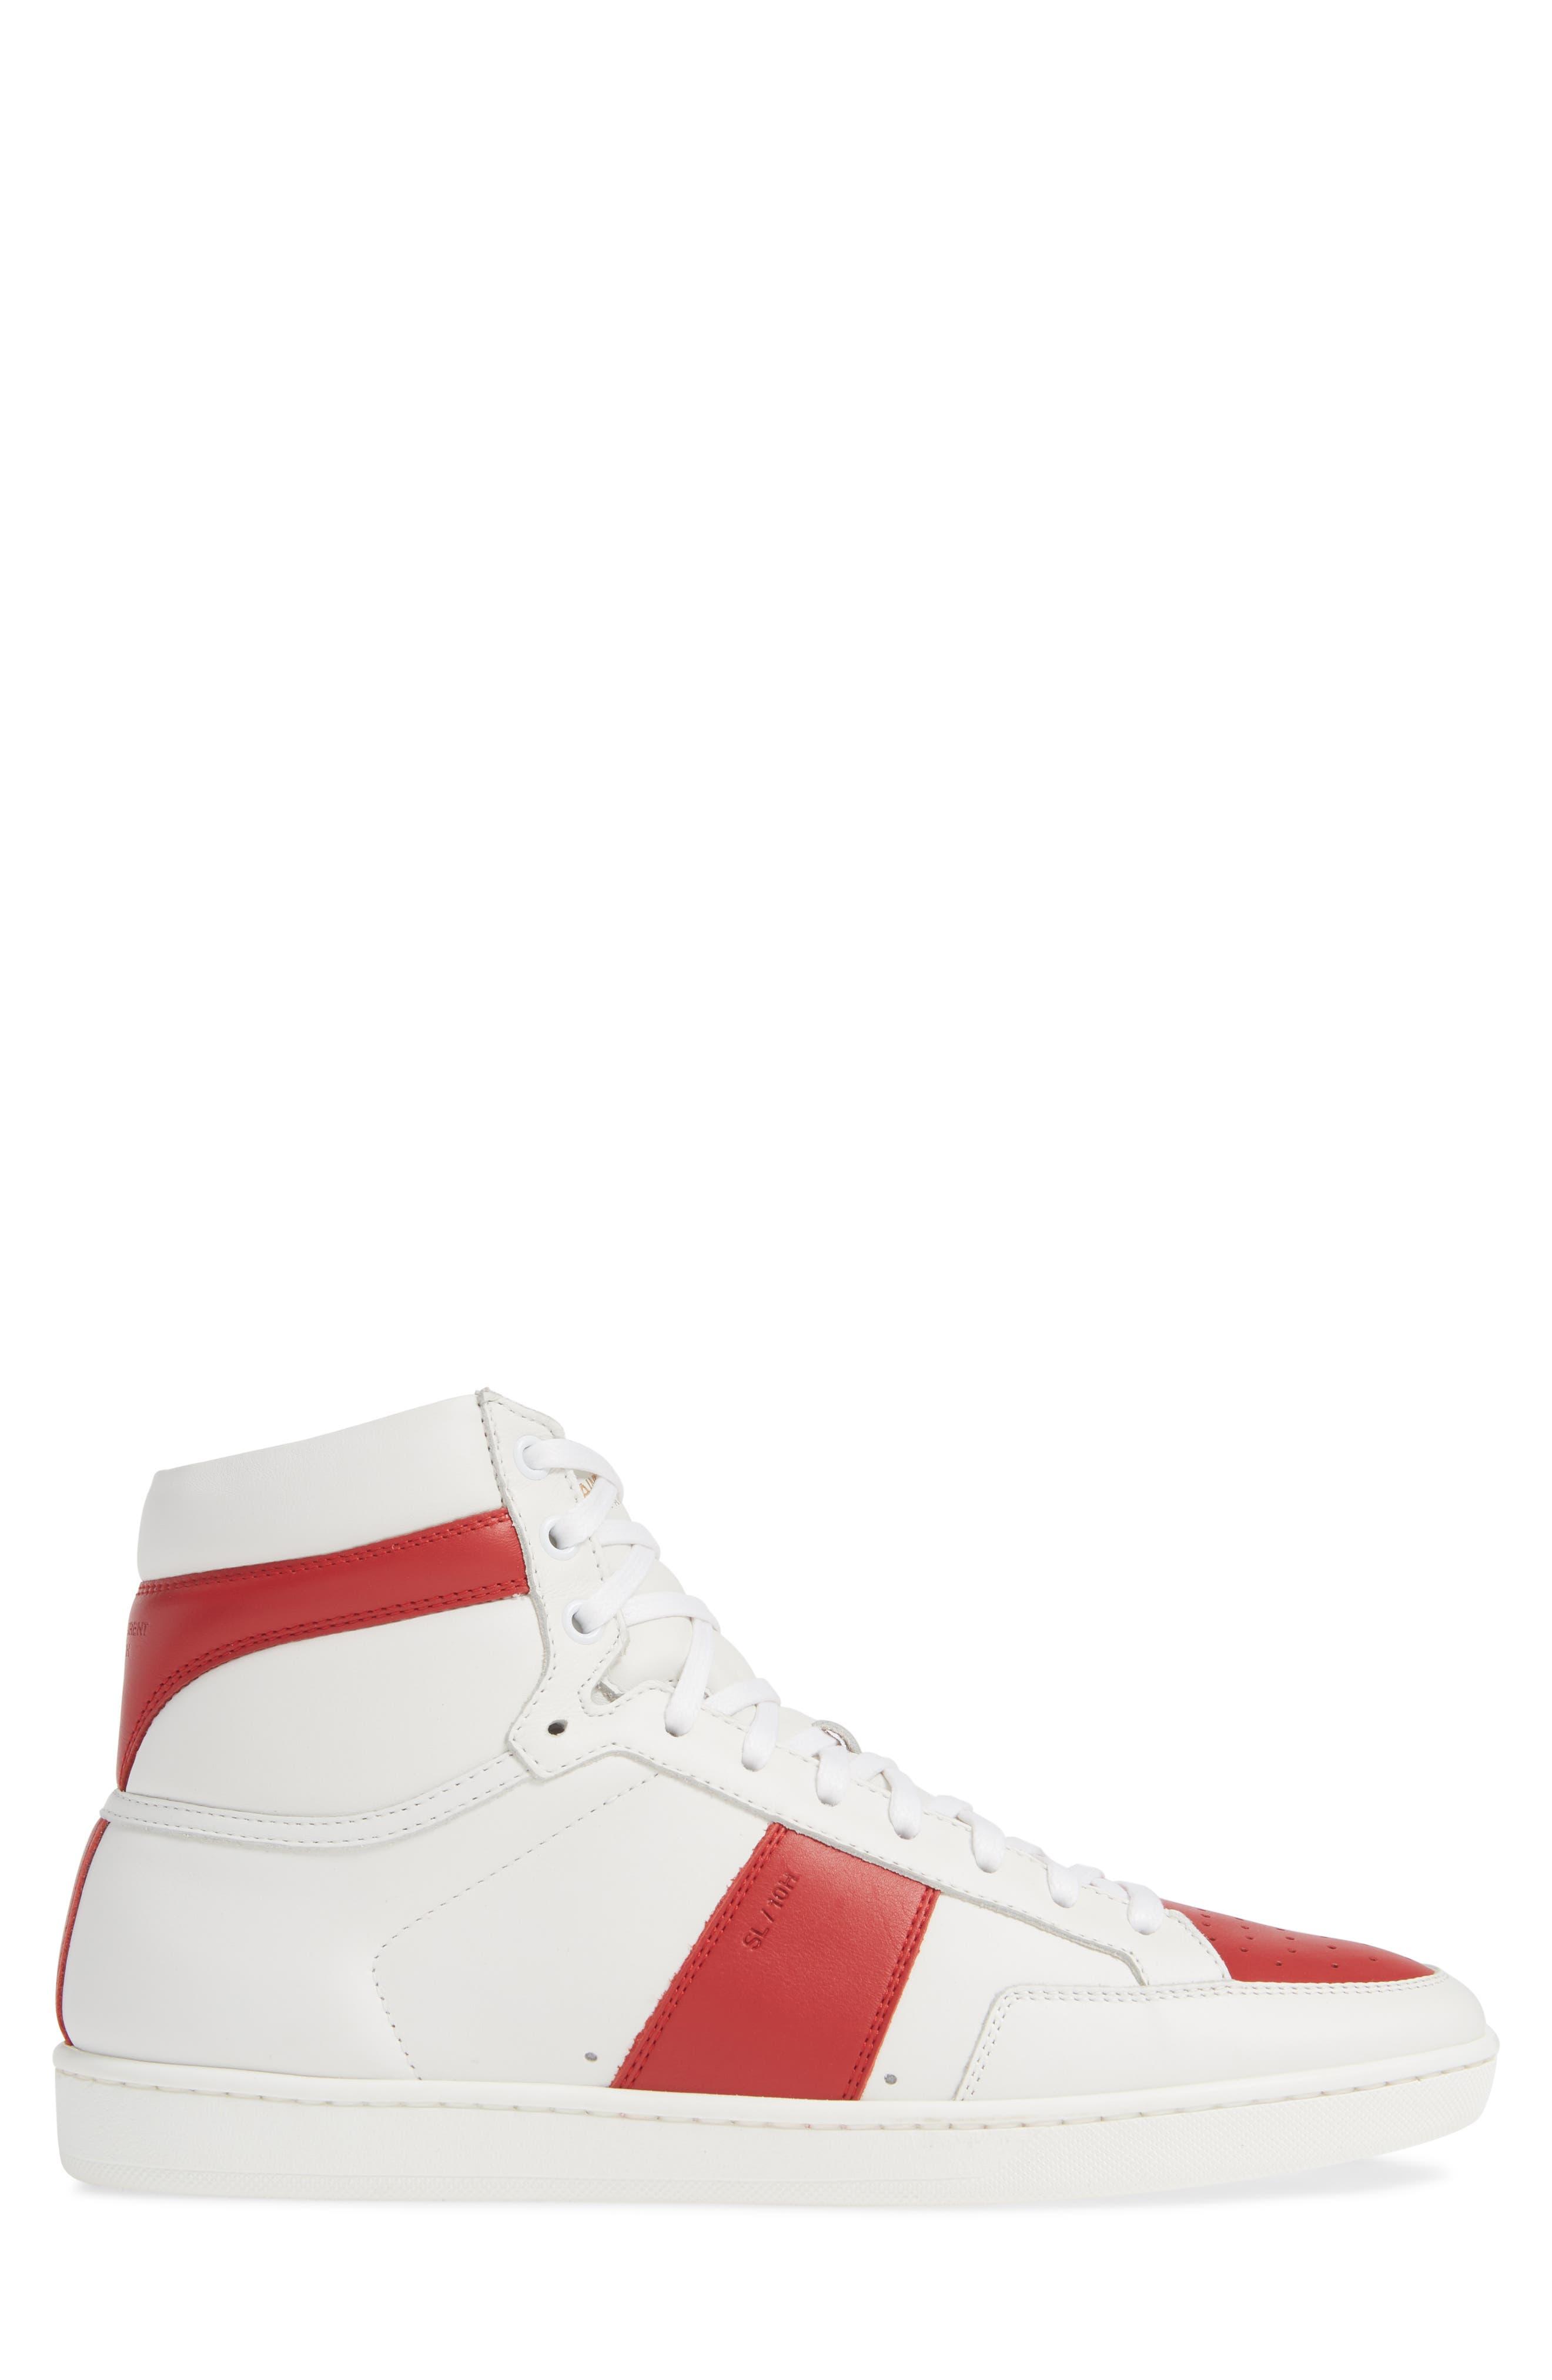 SAINT LAURENT, SL/10H Signature Court Classic High-Top Sneaker, Alternate thumbnail 3, color, WHITE/ MULTI